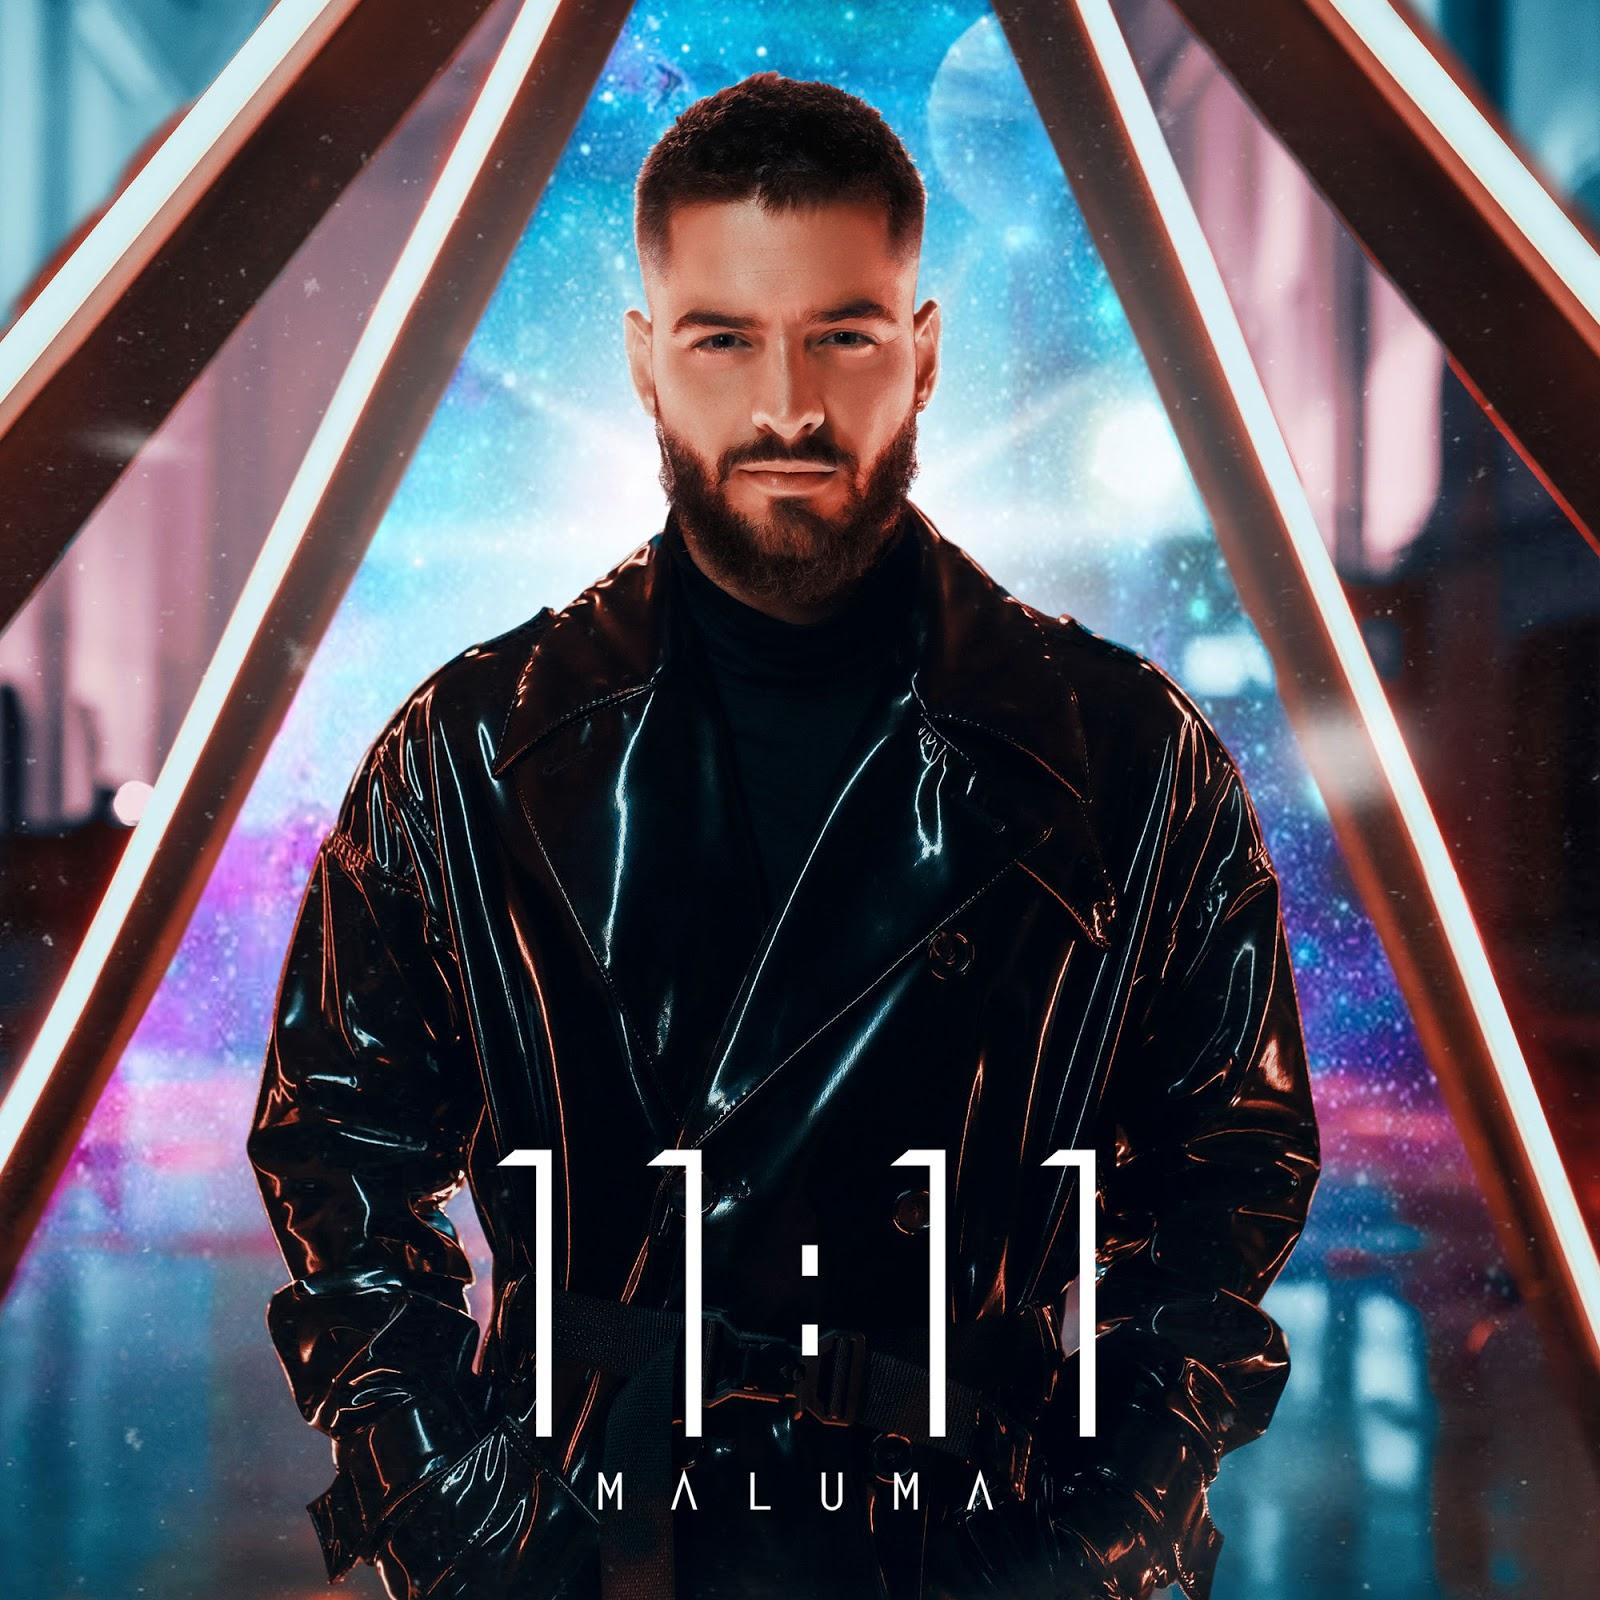 Maluma – 11:11 (Download Álbum) (2019) - REGGAETON BRASIL - MAIOR